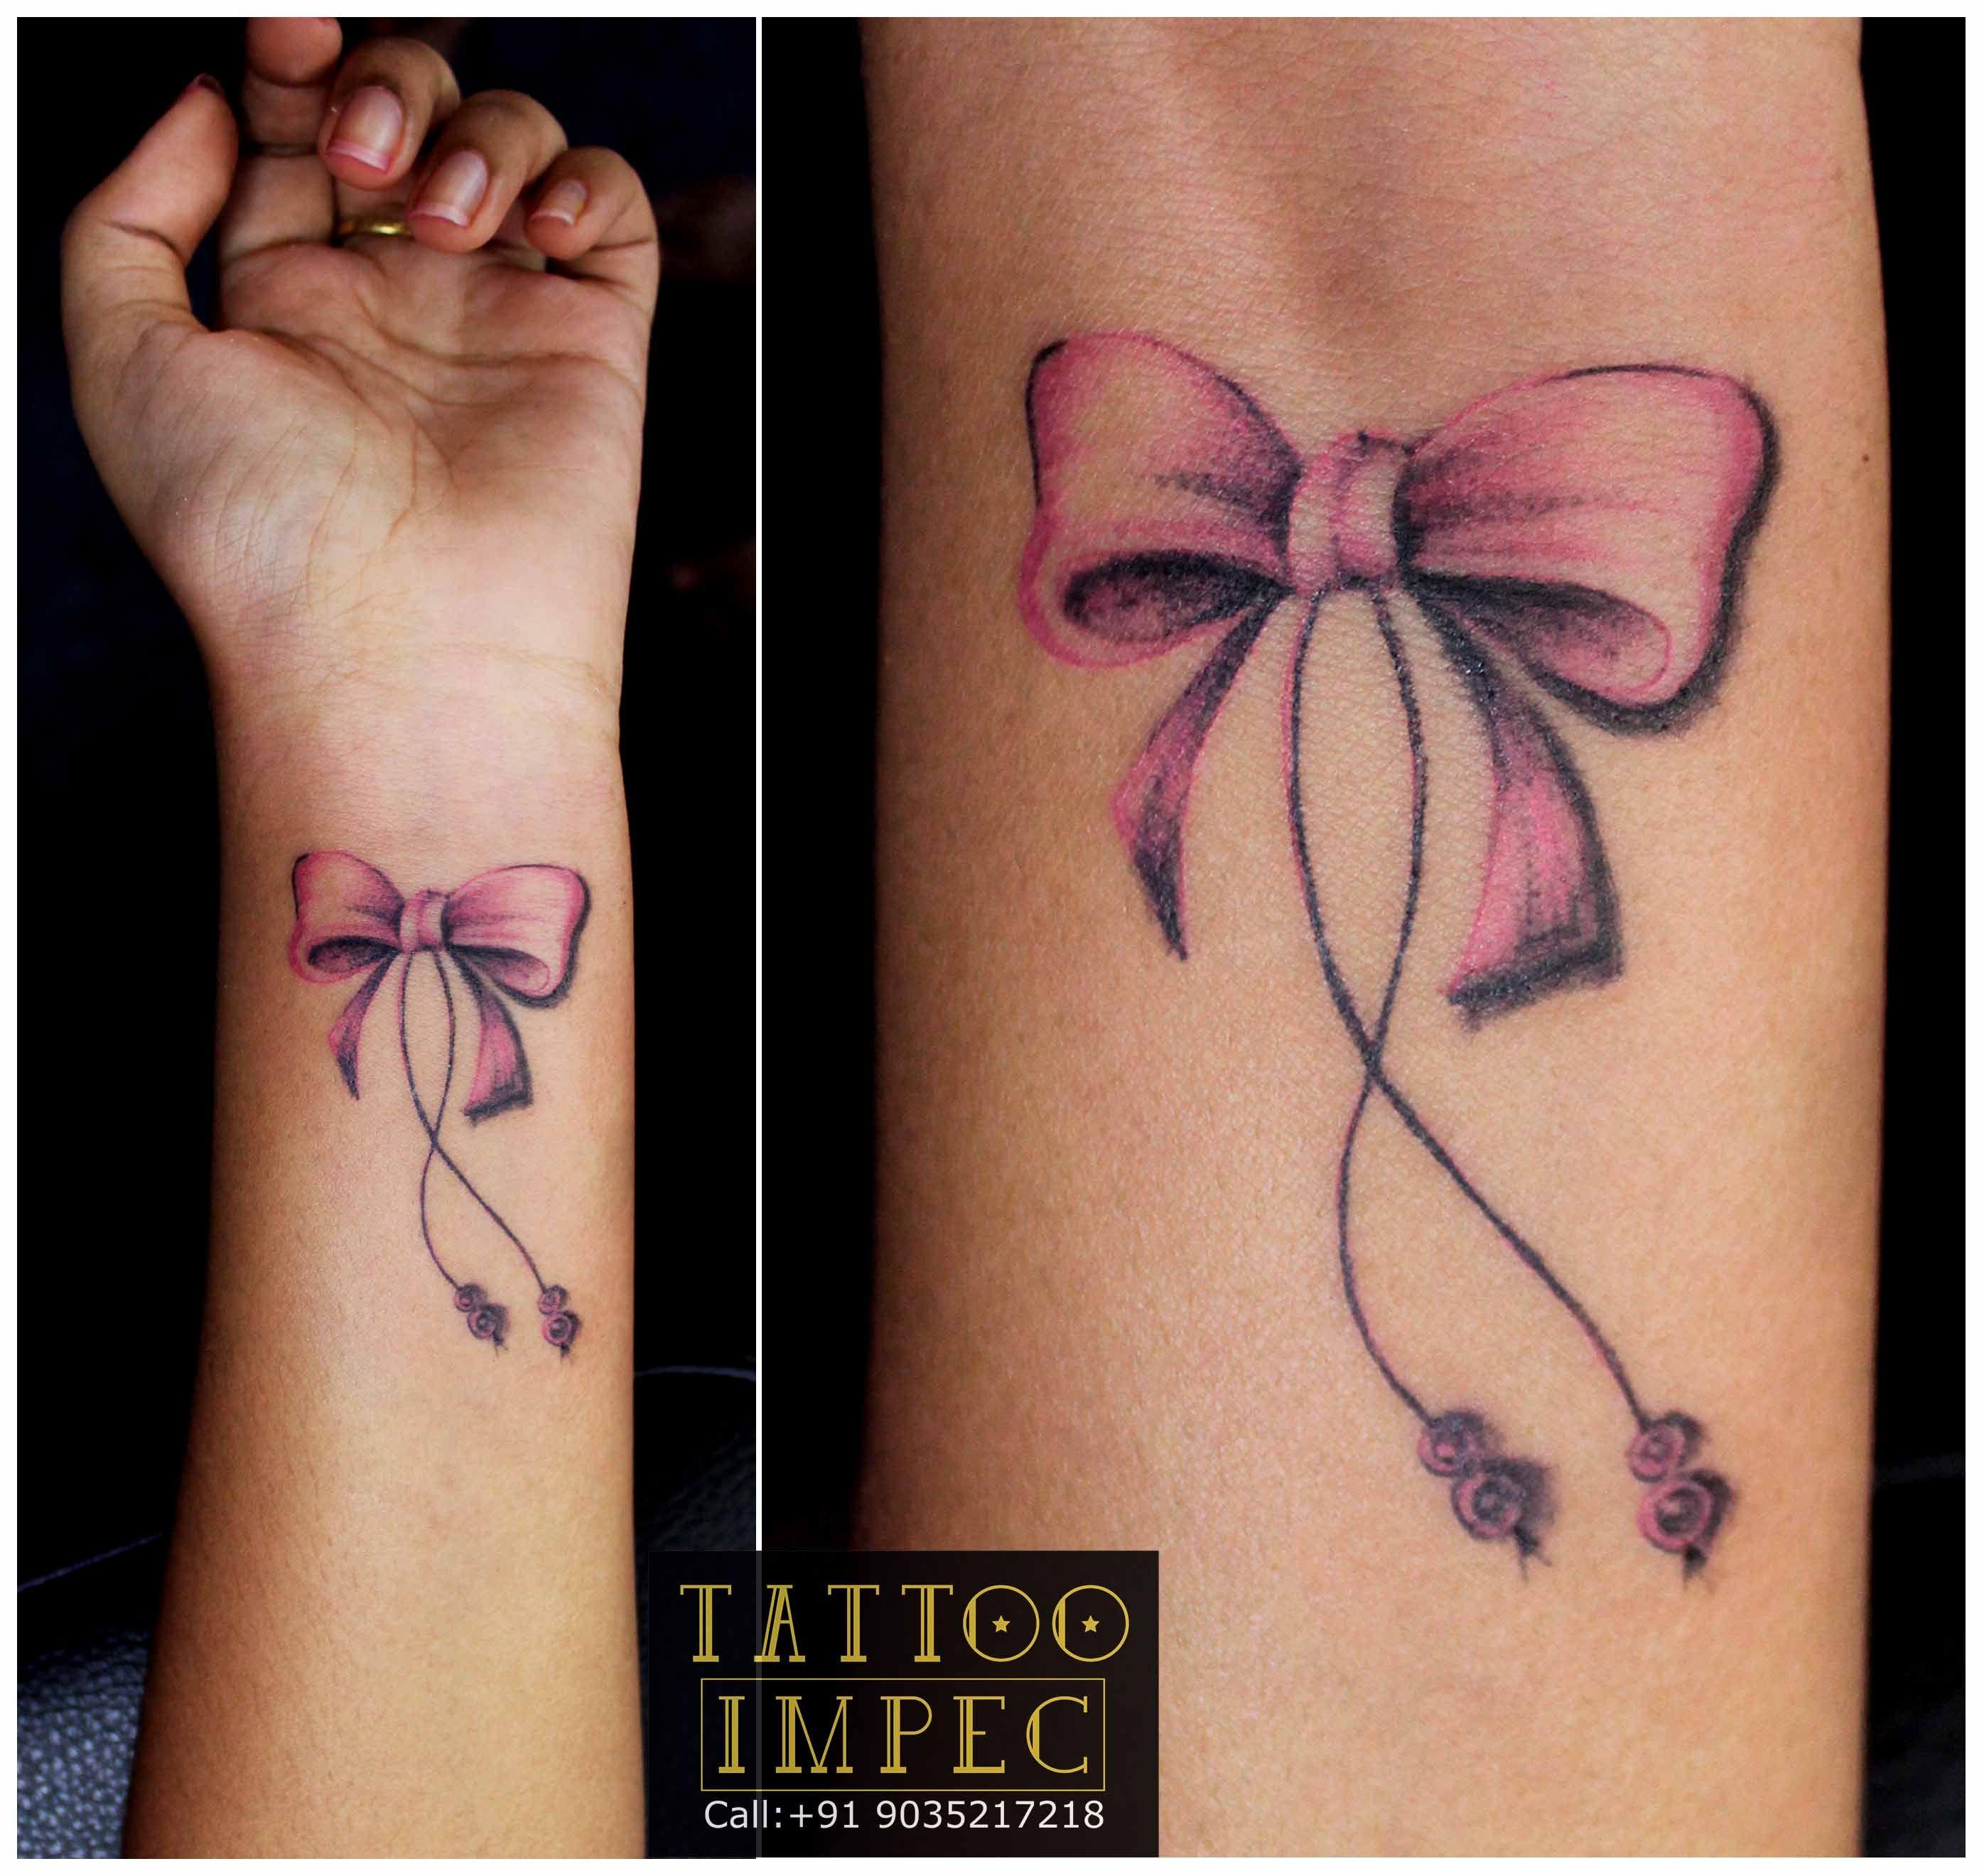 Tattos of bows